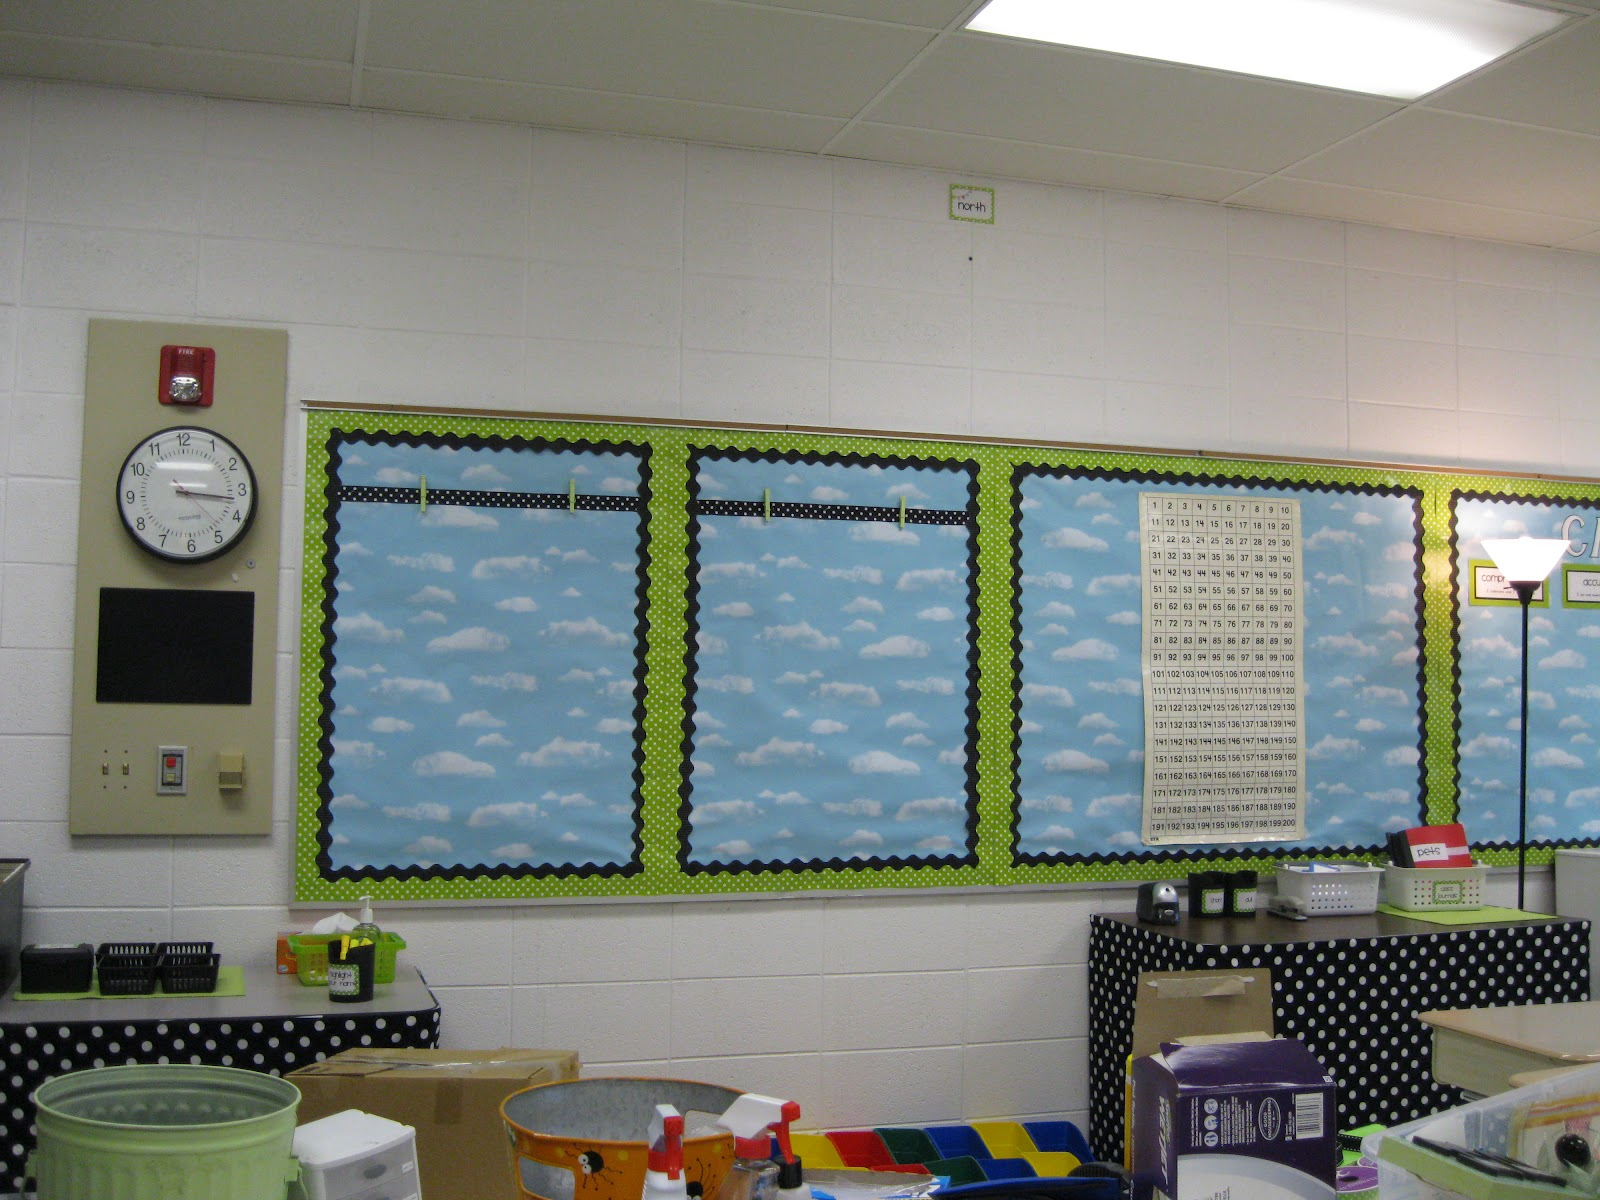 Unique Classroom Design : Creative happenings monday made it classroom design